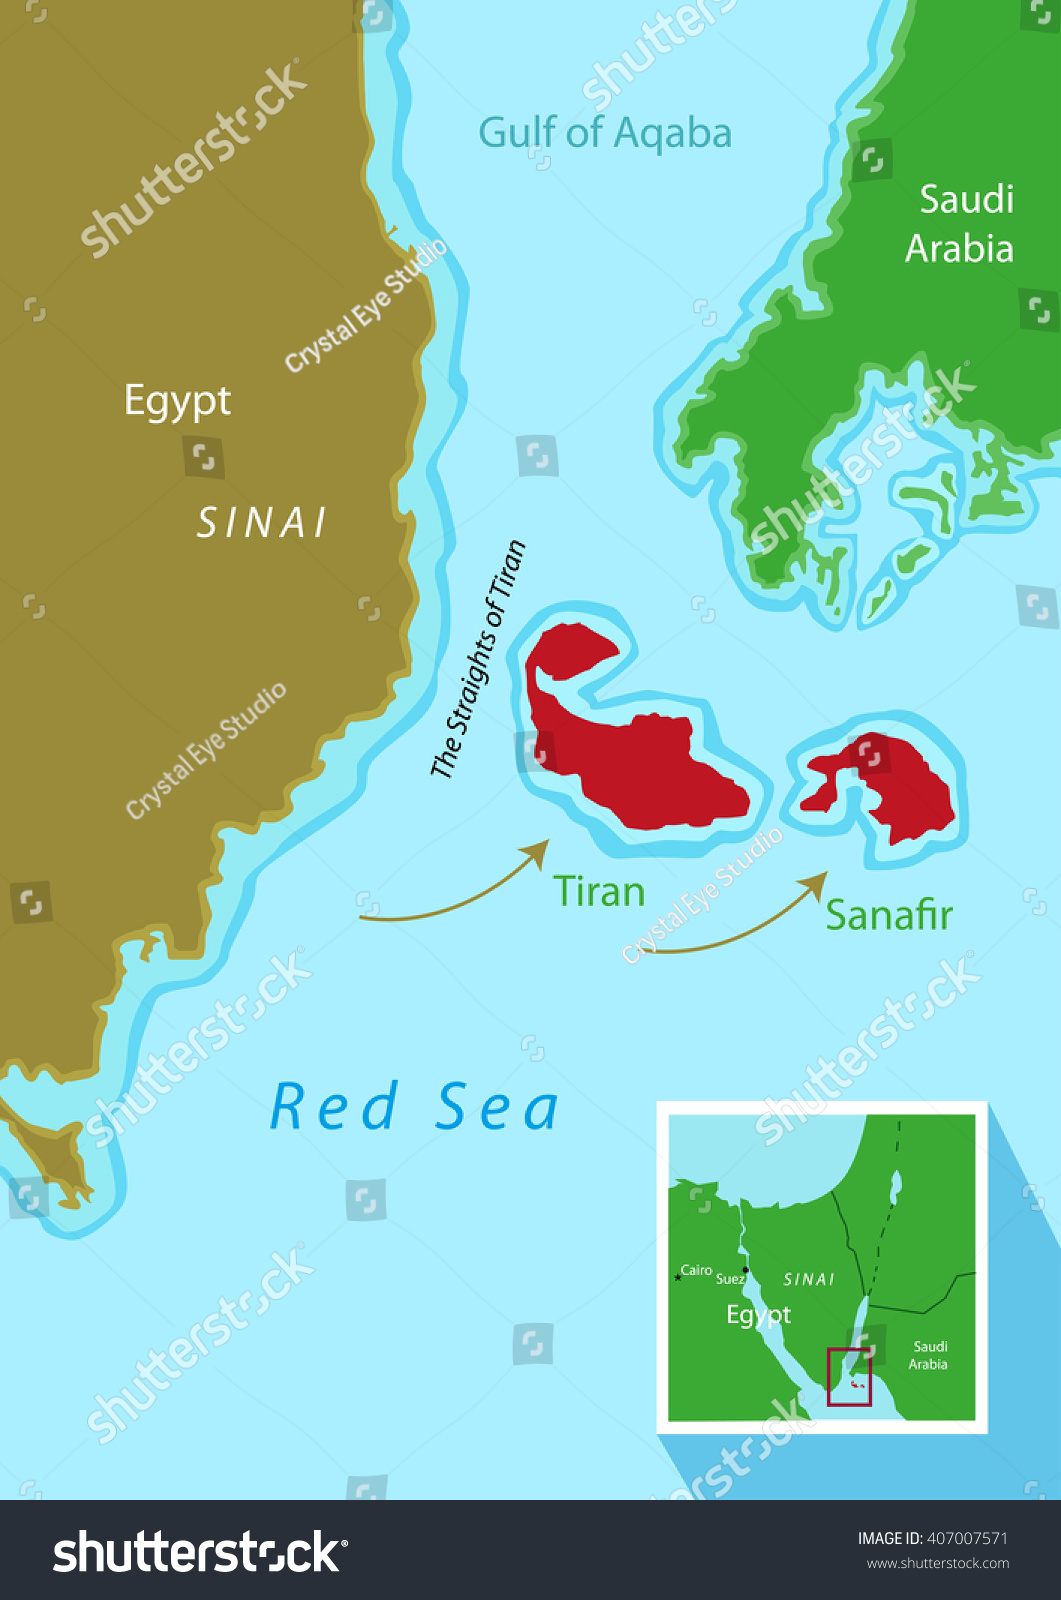 Tiran Sanafir Islands Deal Between Egypt Stock Vector - Map of egypt and saudi arabia